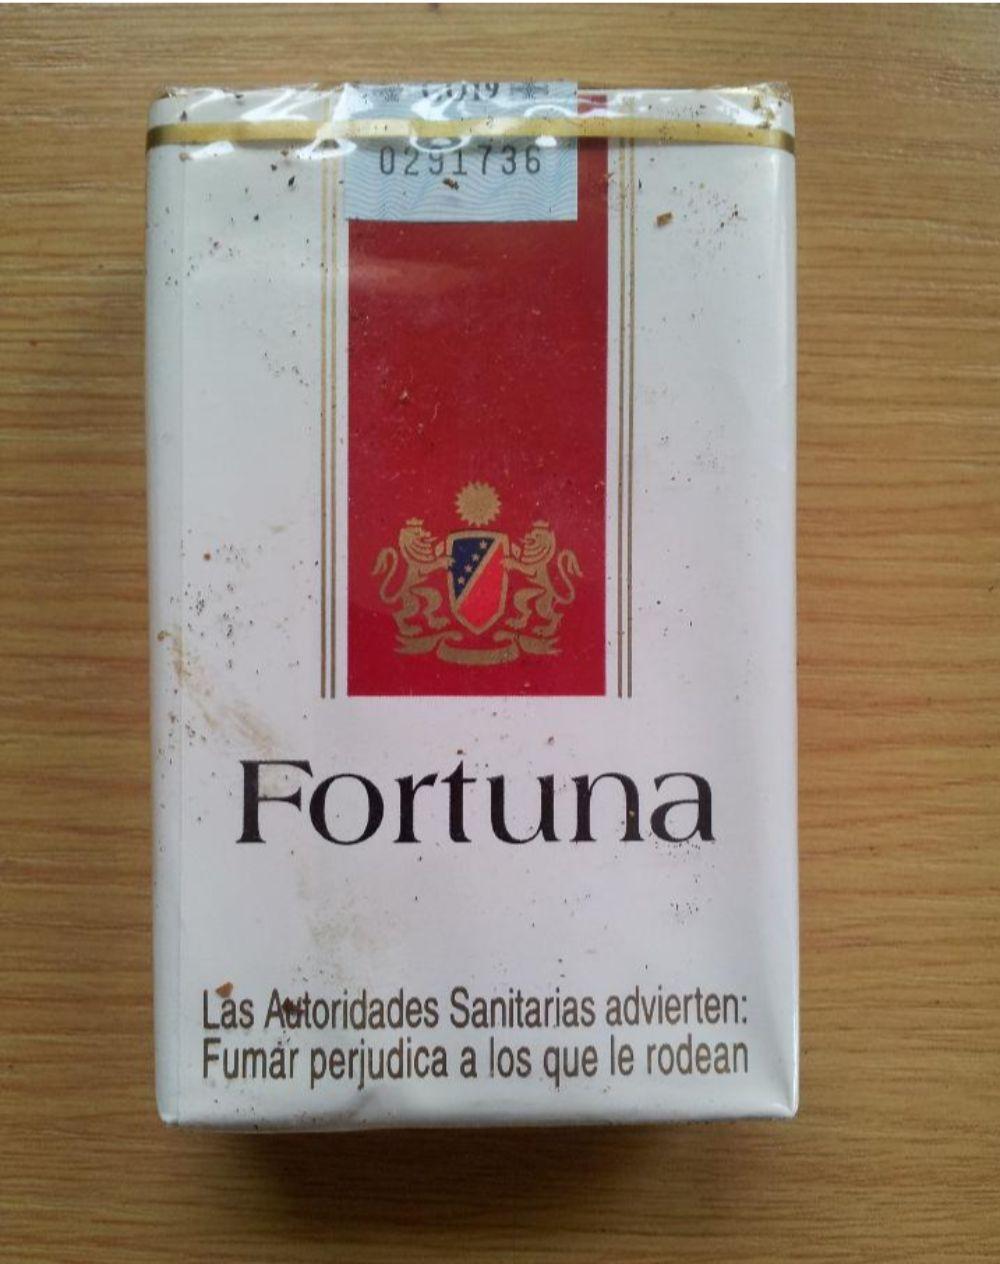 tabaco fortuna